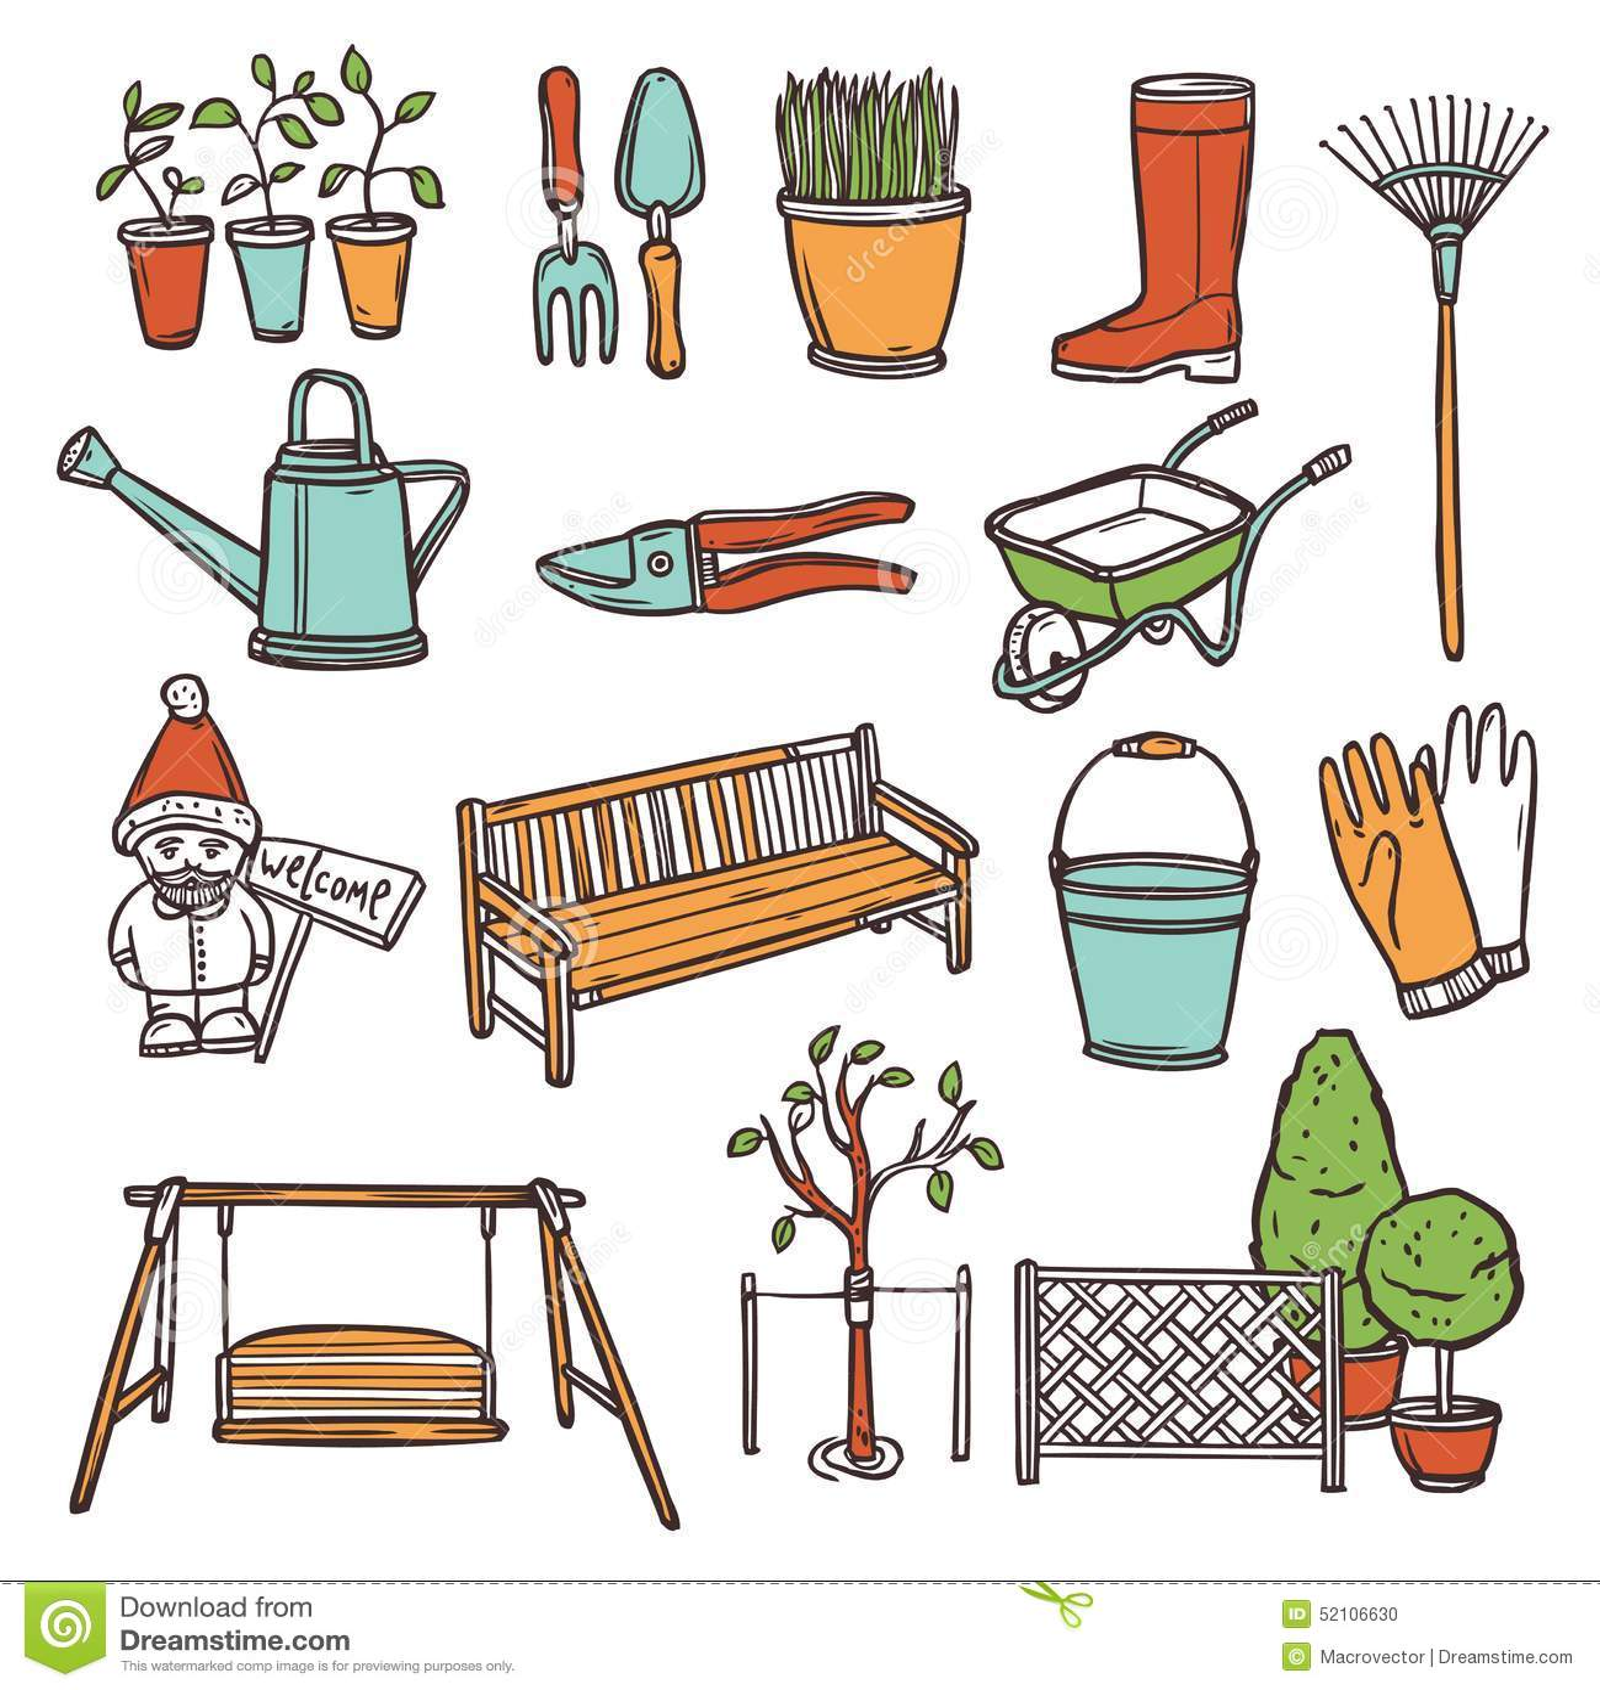 Gardening tools set stock vector image 52106630 for Garden implements tools